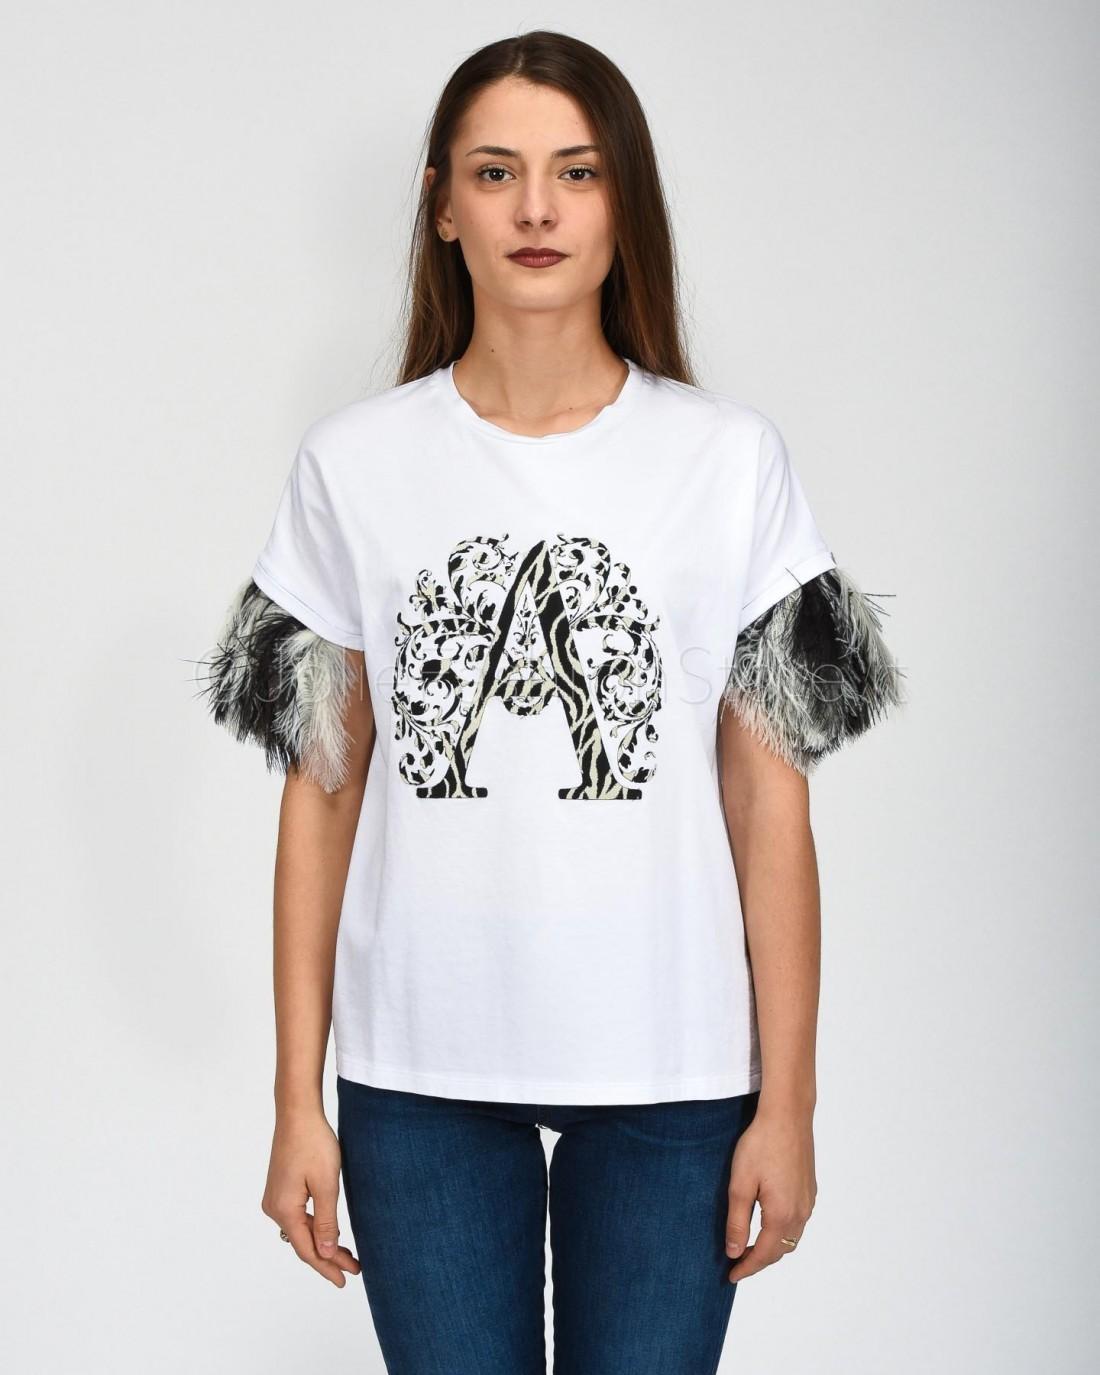 Alessandra Chamonix T-Shirt Bianca con Logo Nero e Piume  WZEL